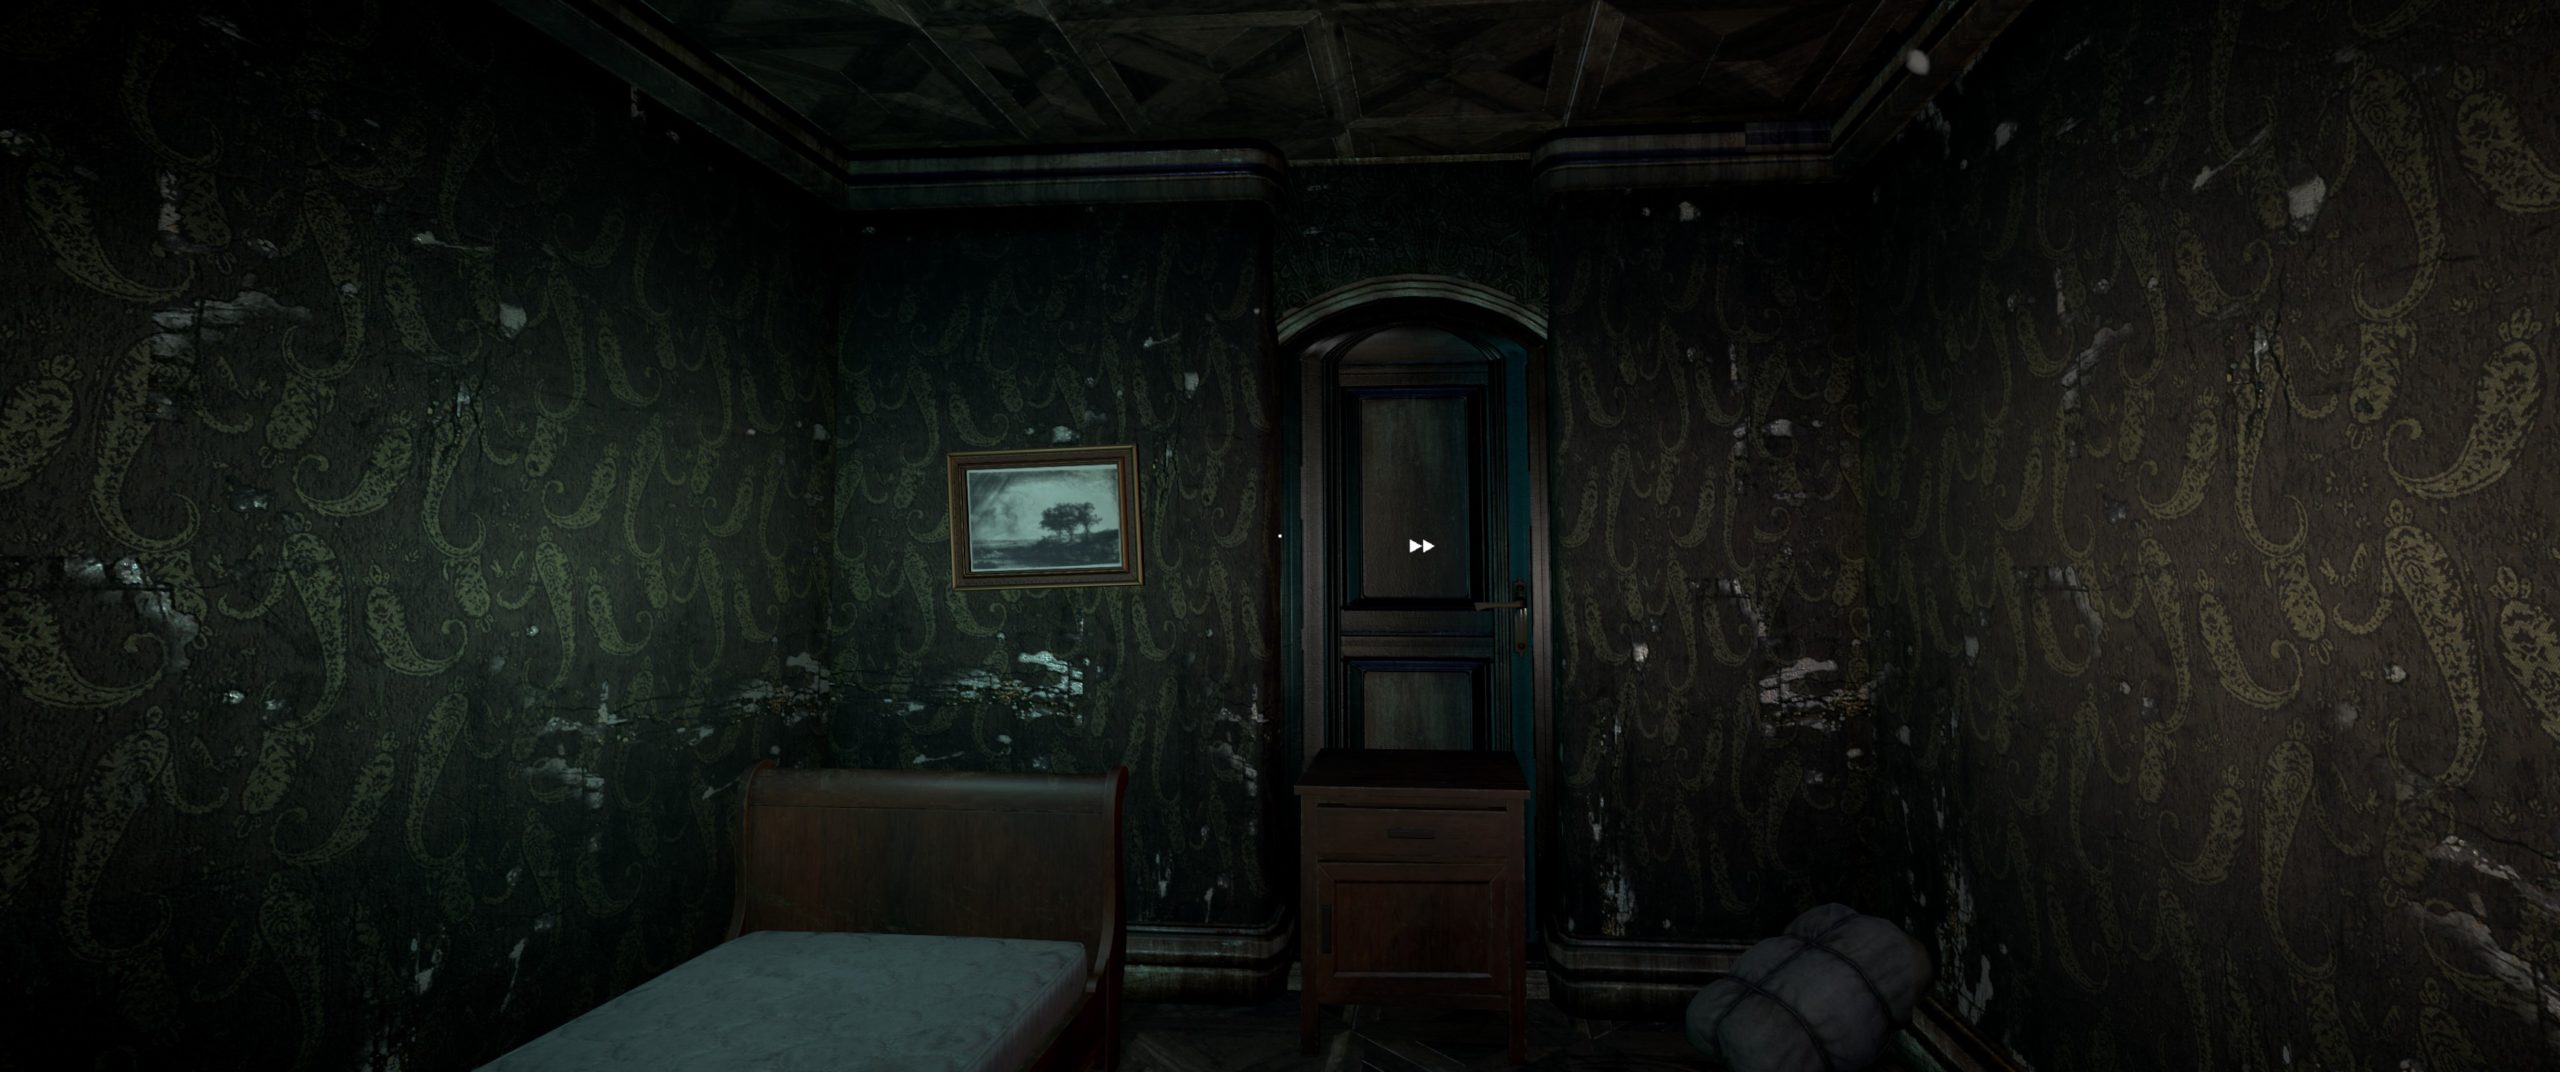 Dagon - zrzut ekranu 3